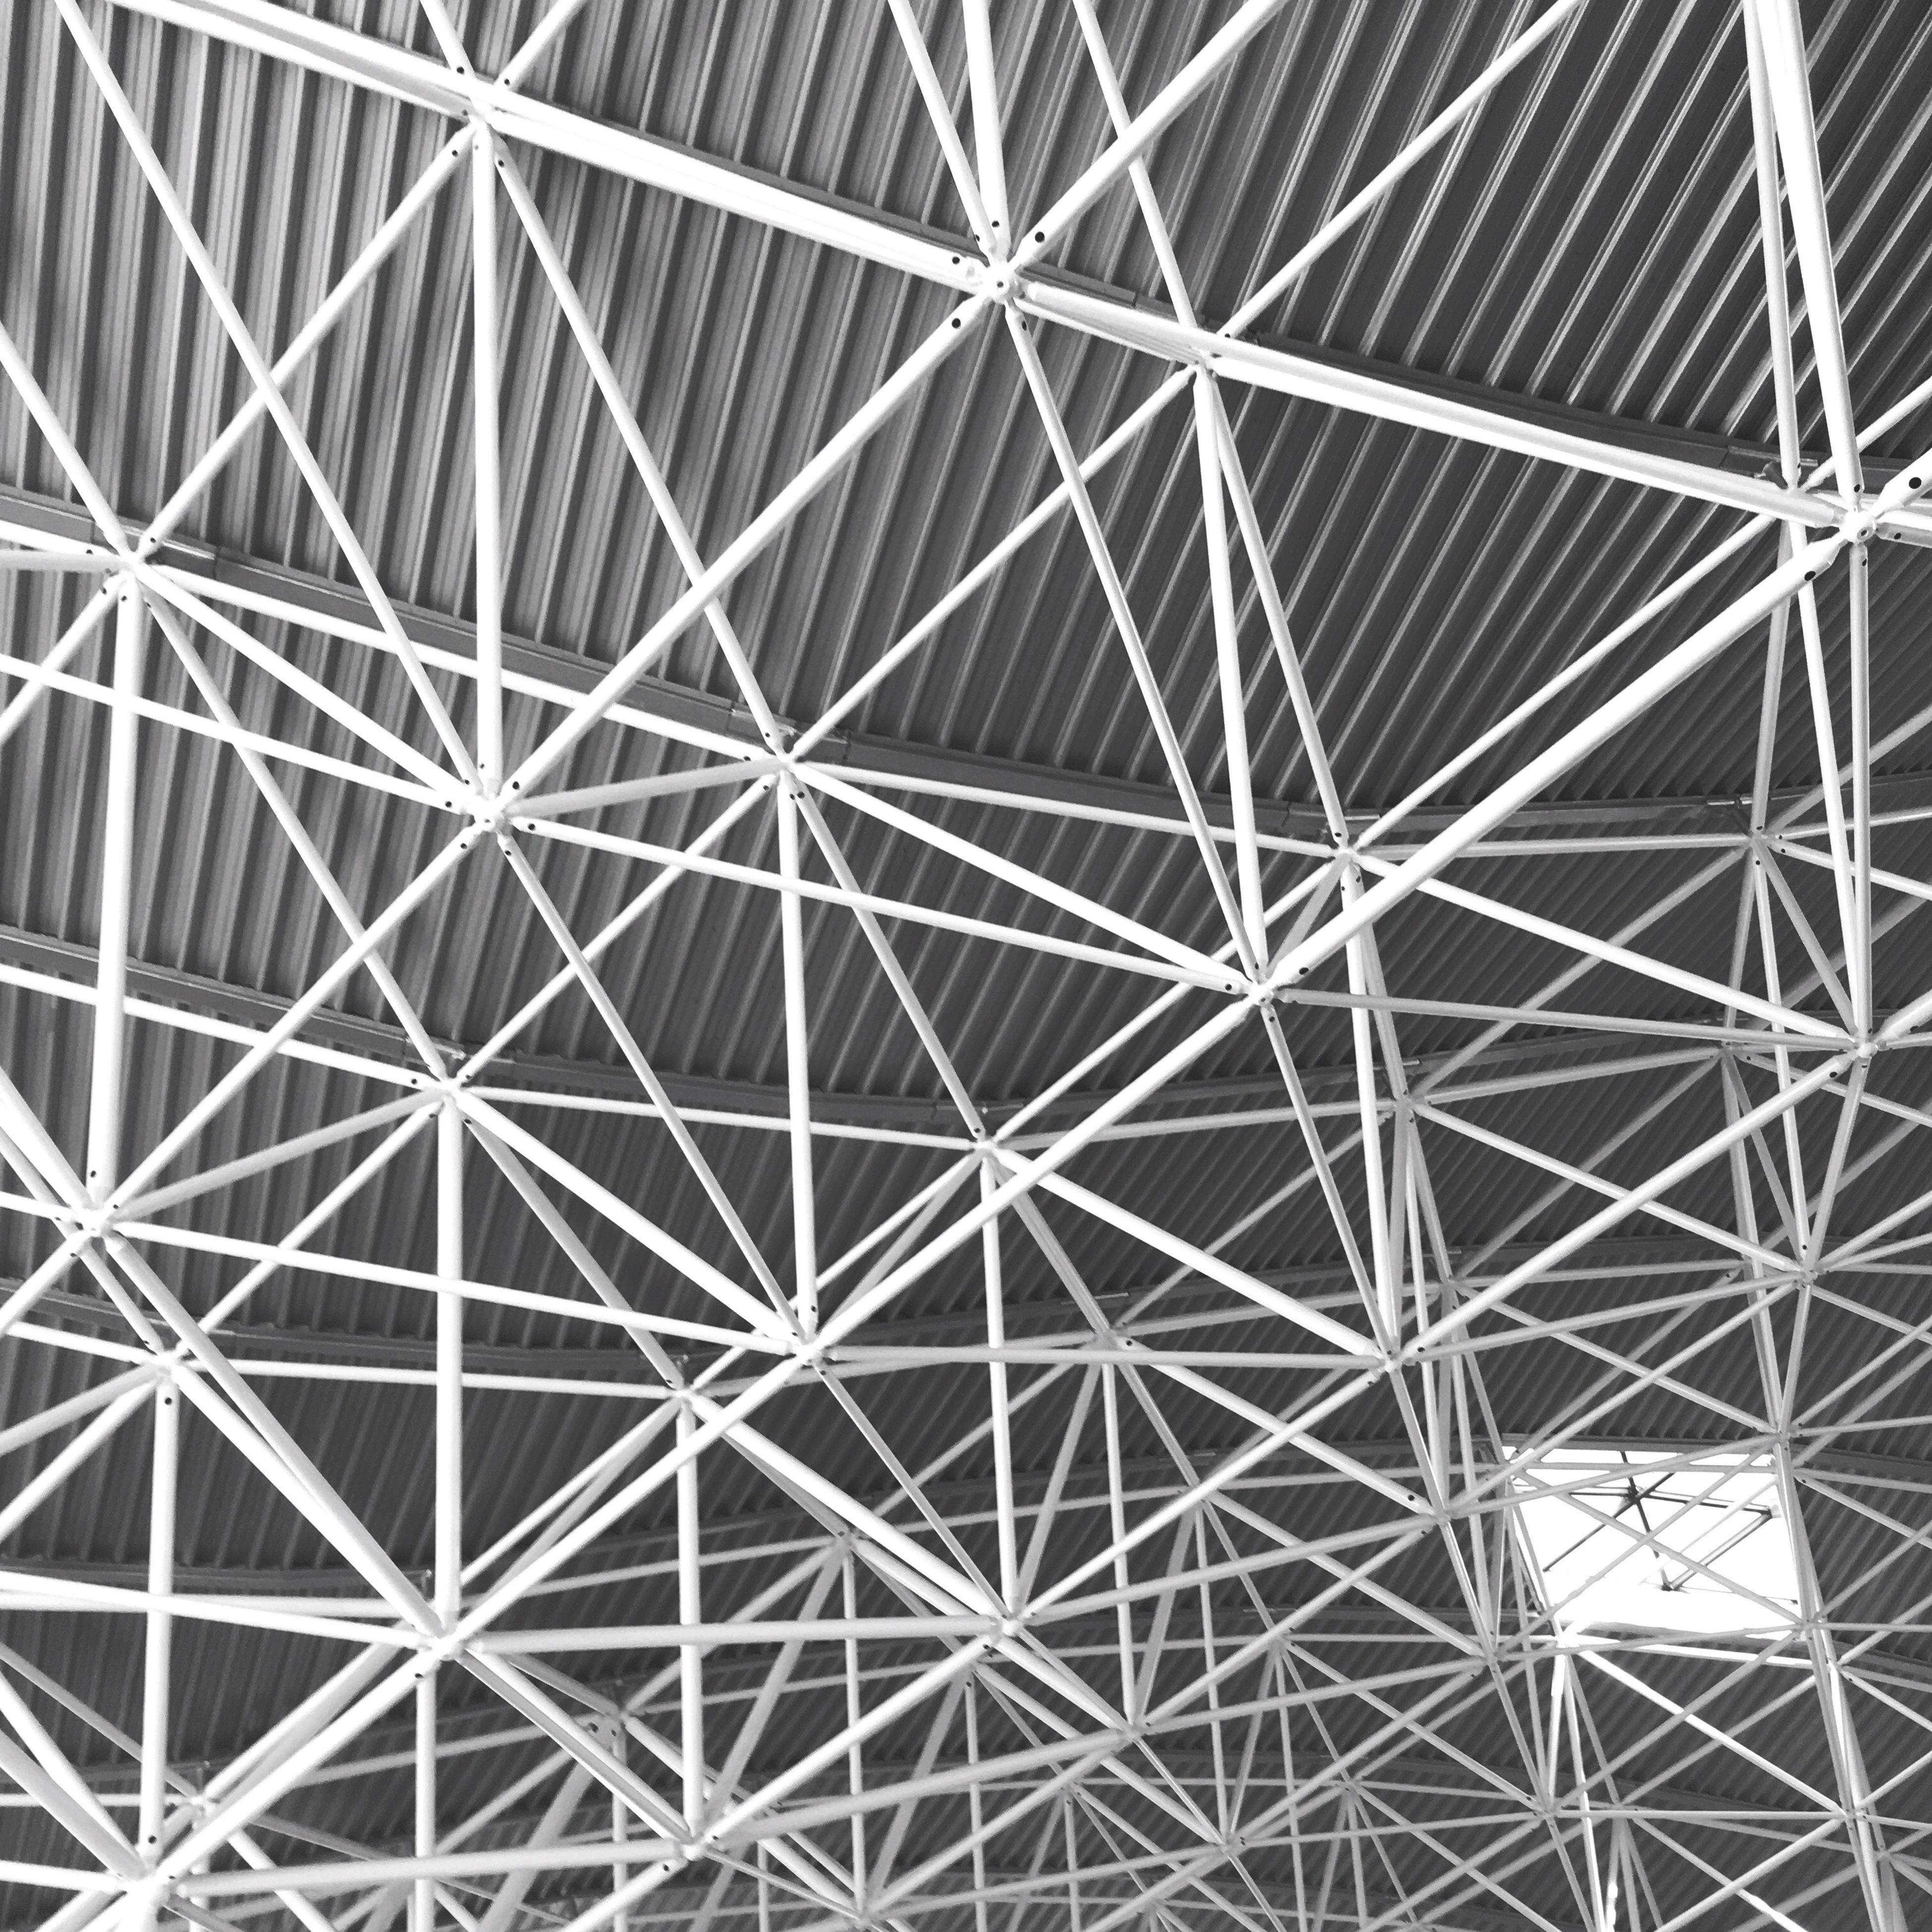 Construction. Zagreb airport